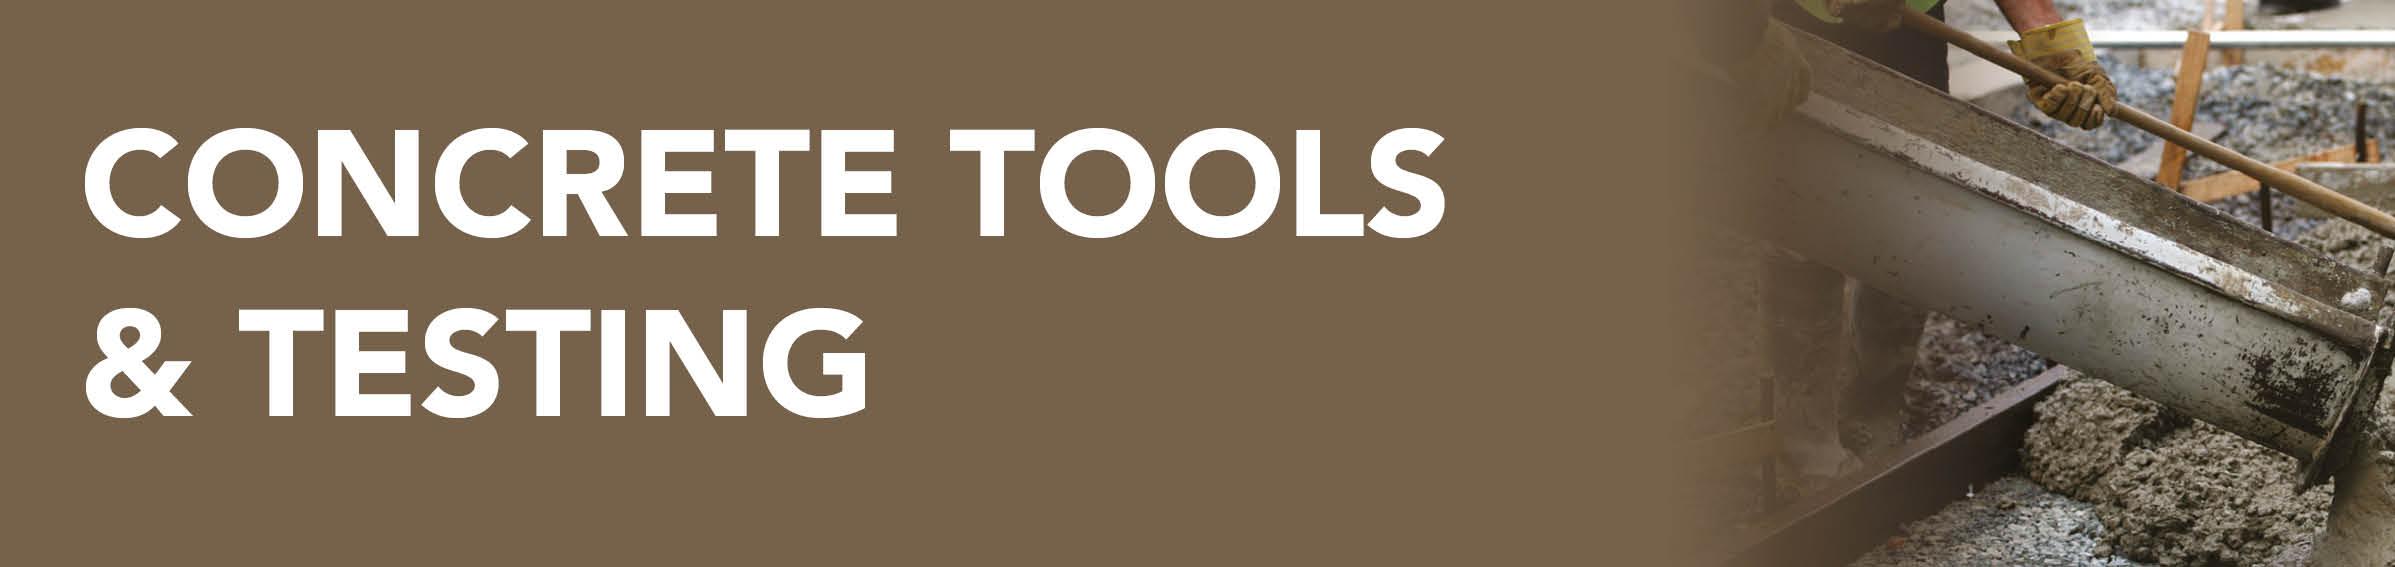 Concrete Tools & Testing